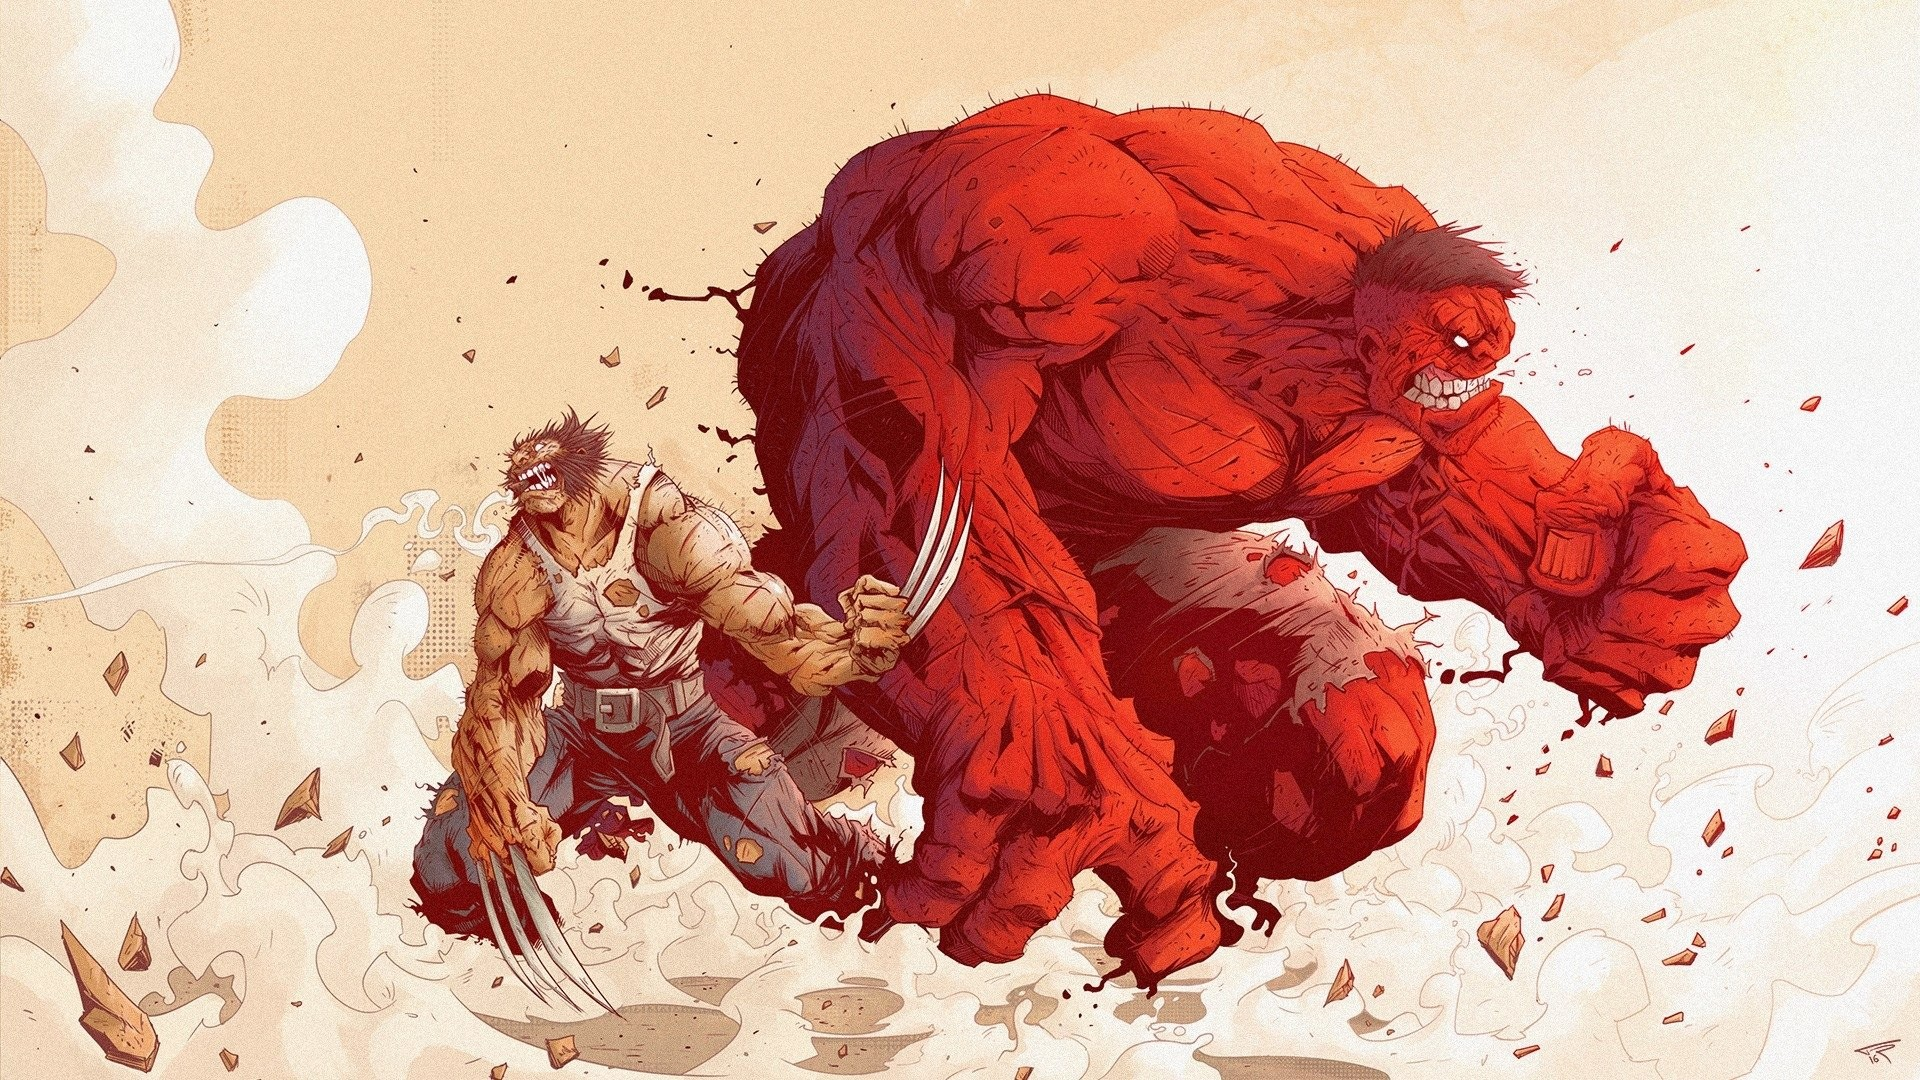 Res: 1920x1080, Hulk Red Hulk · HD Wallpaper | Background Image ID:696435